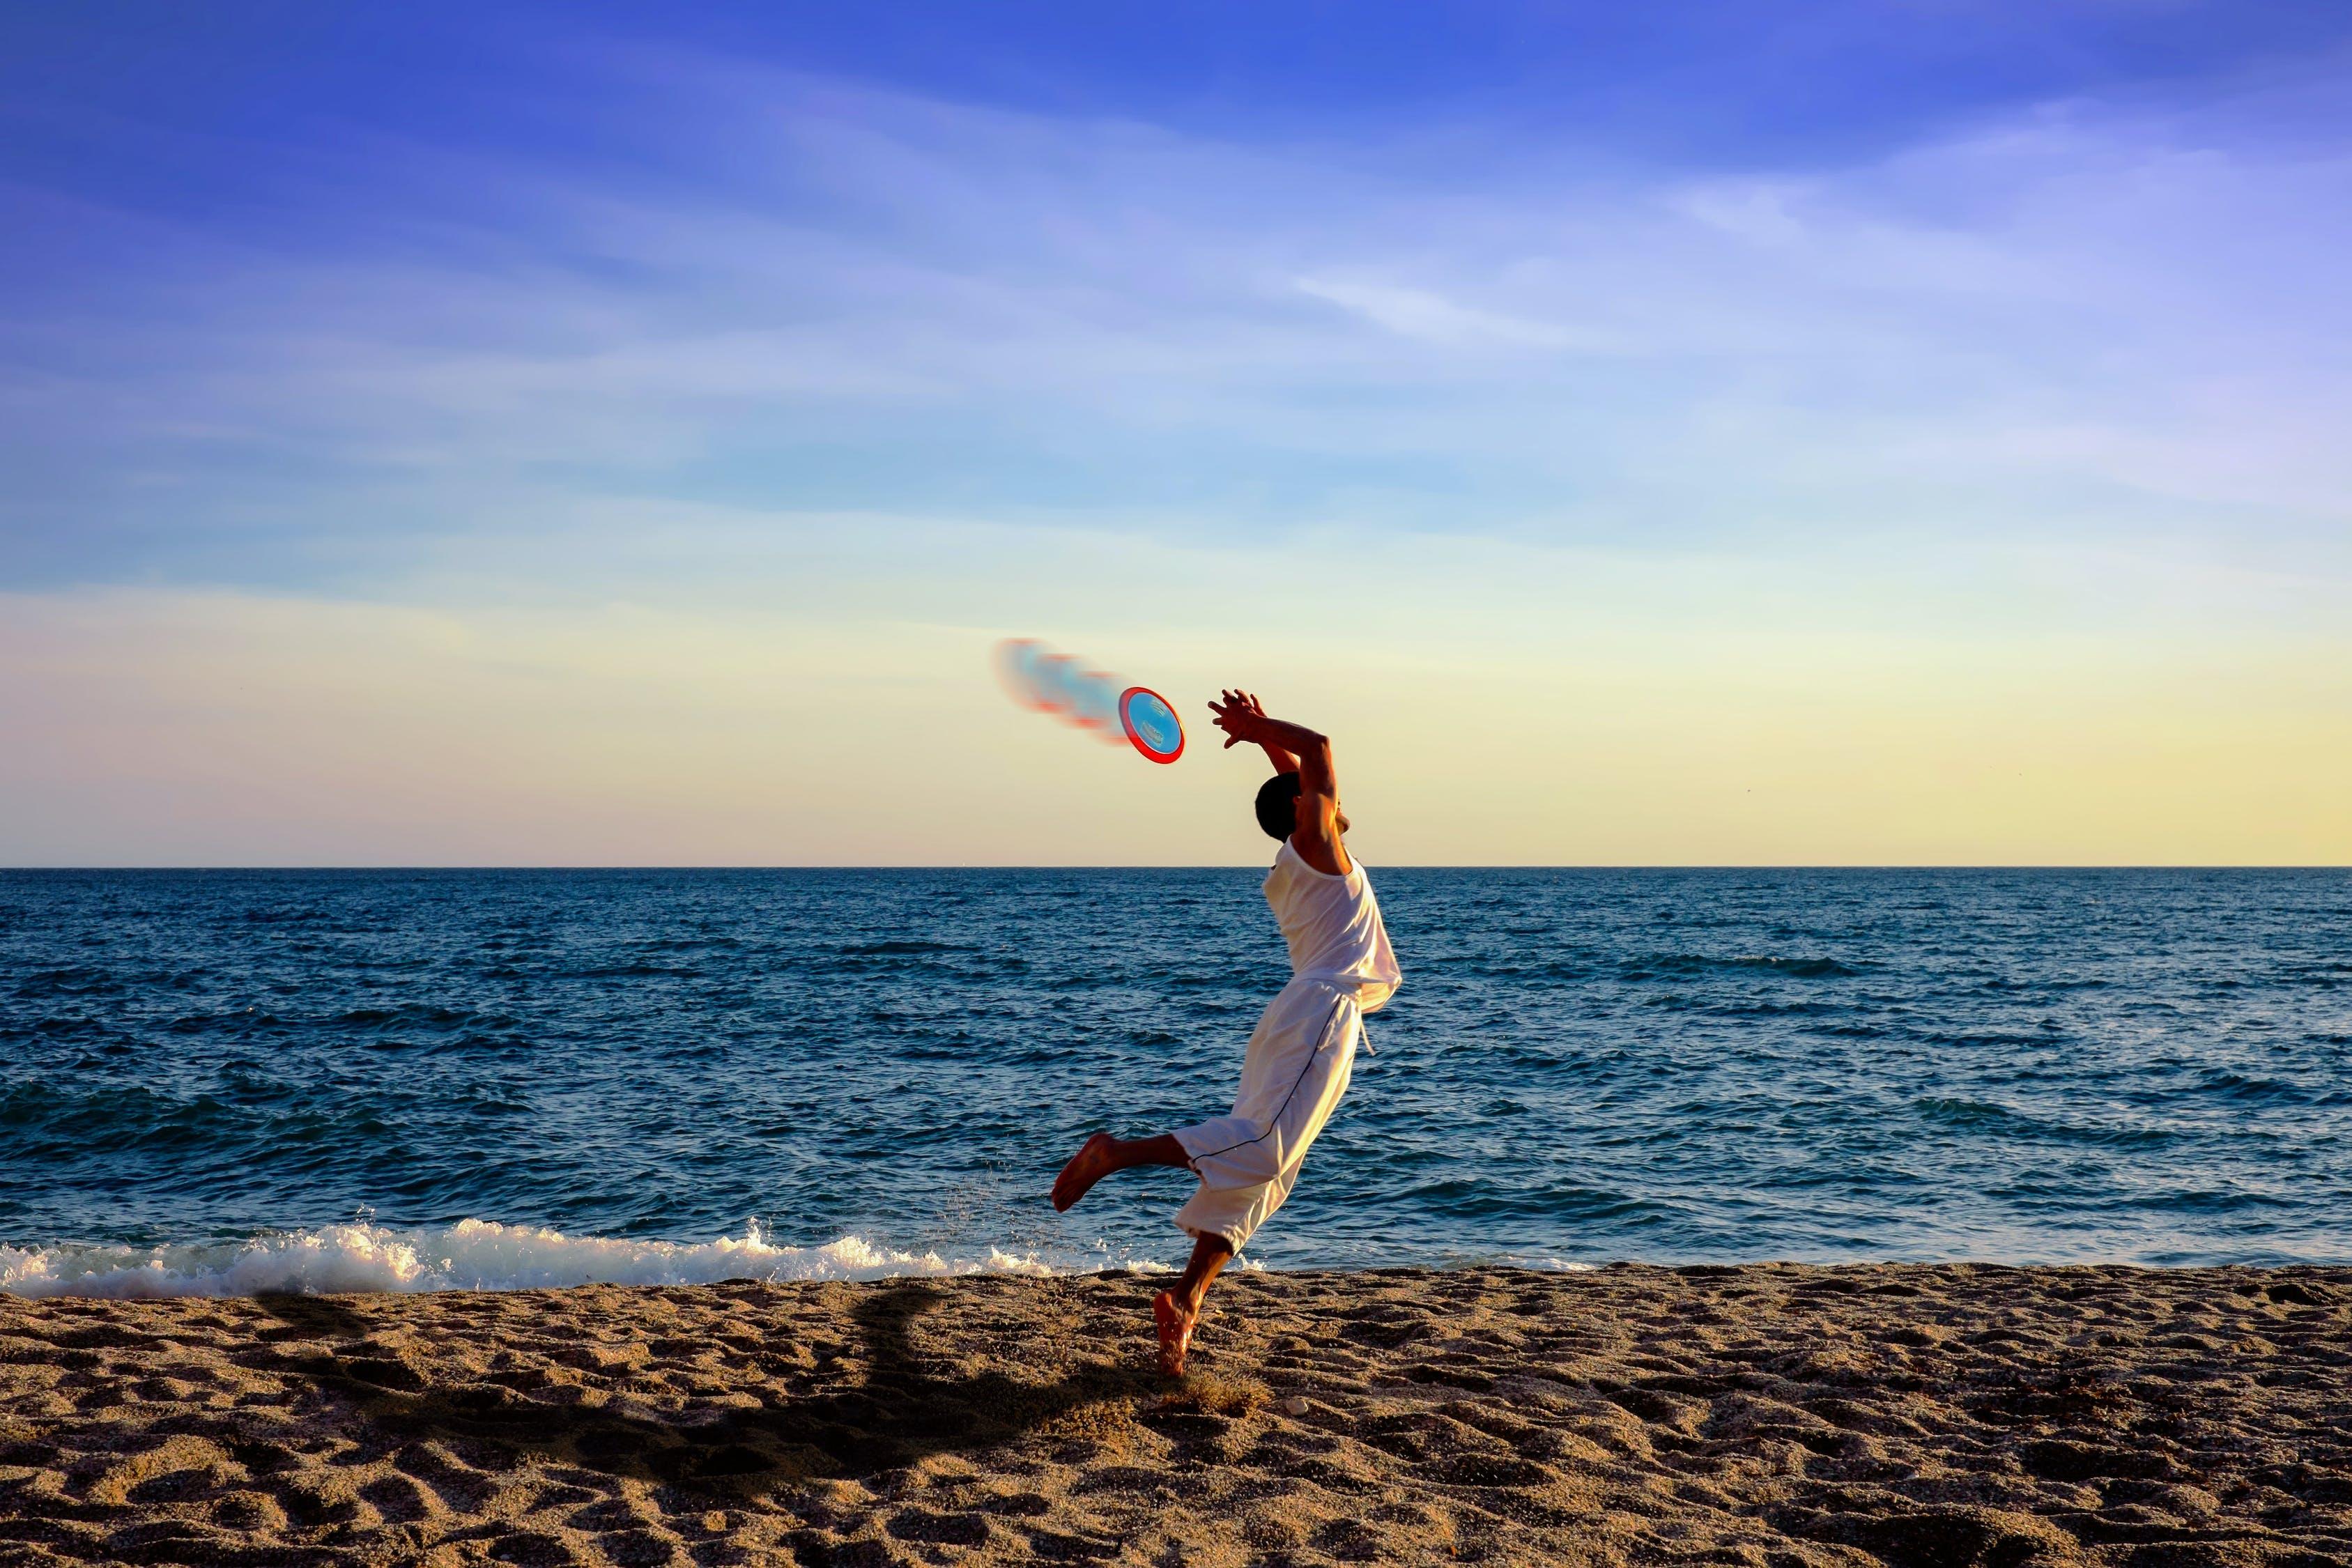 man running to catch the Frisbee near the beach